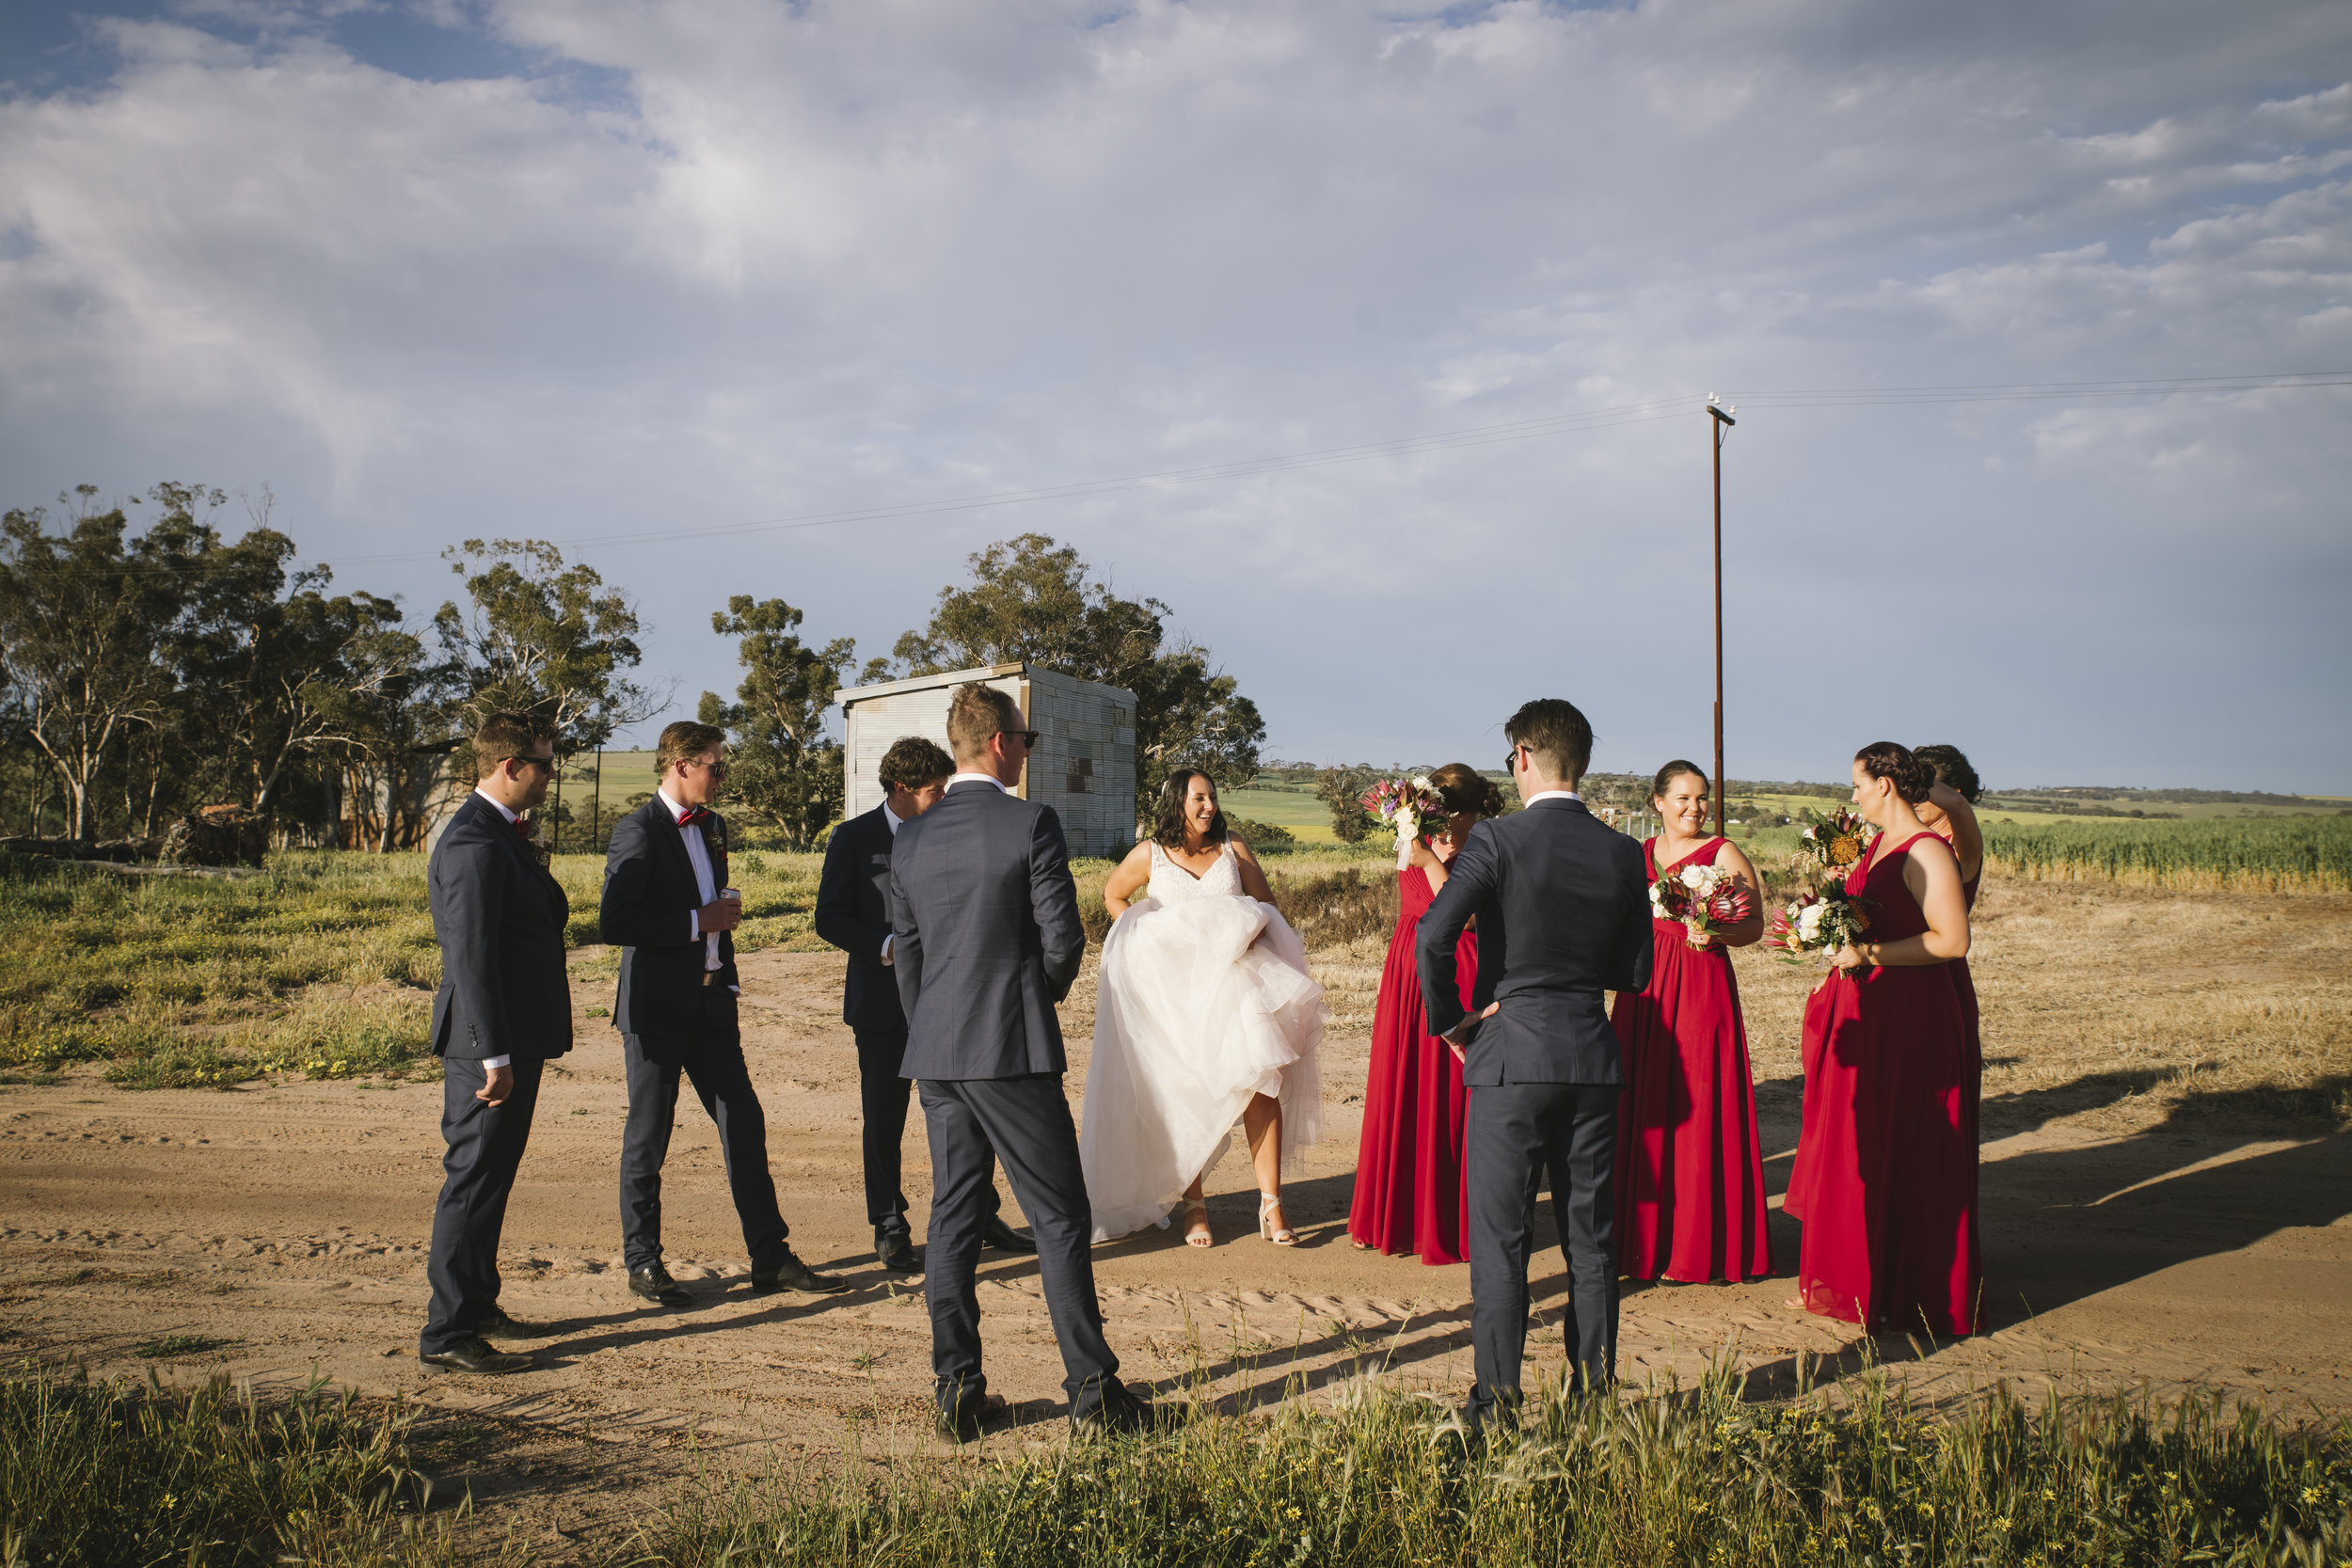 Angie Roe Photography Wheatbelt Avon Valley Farm Wedding (41).jpg